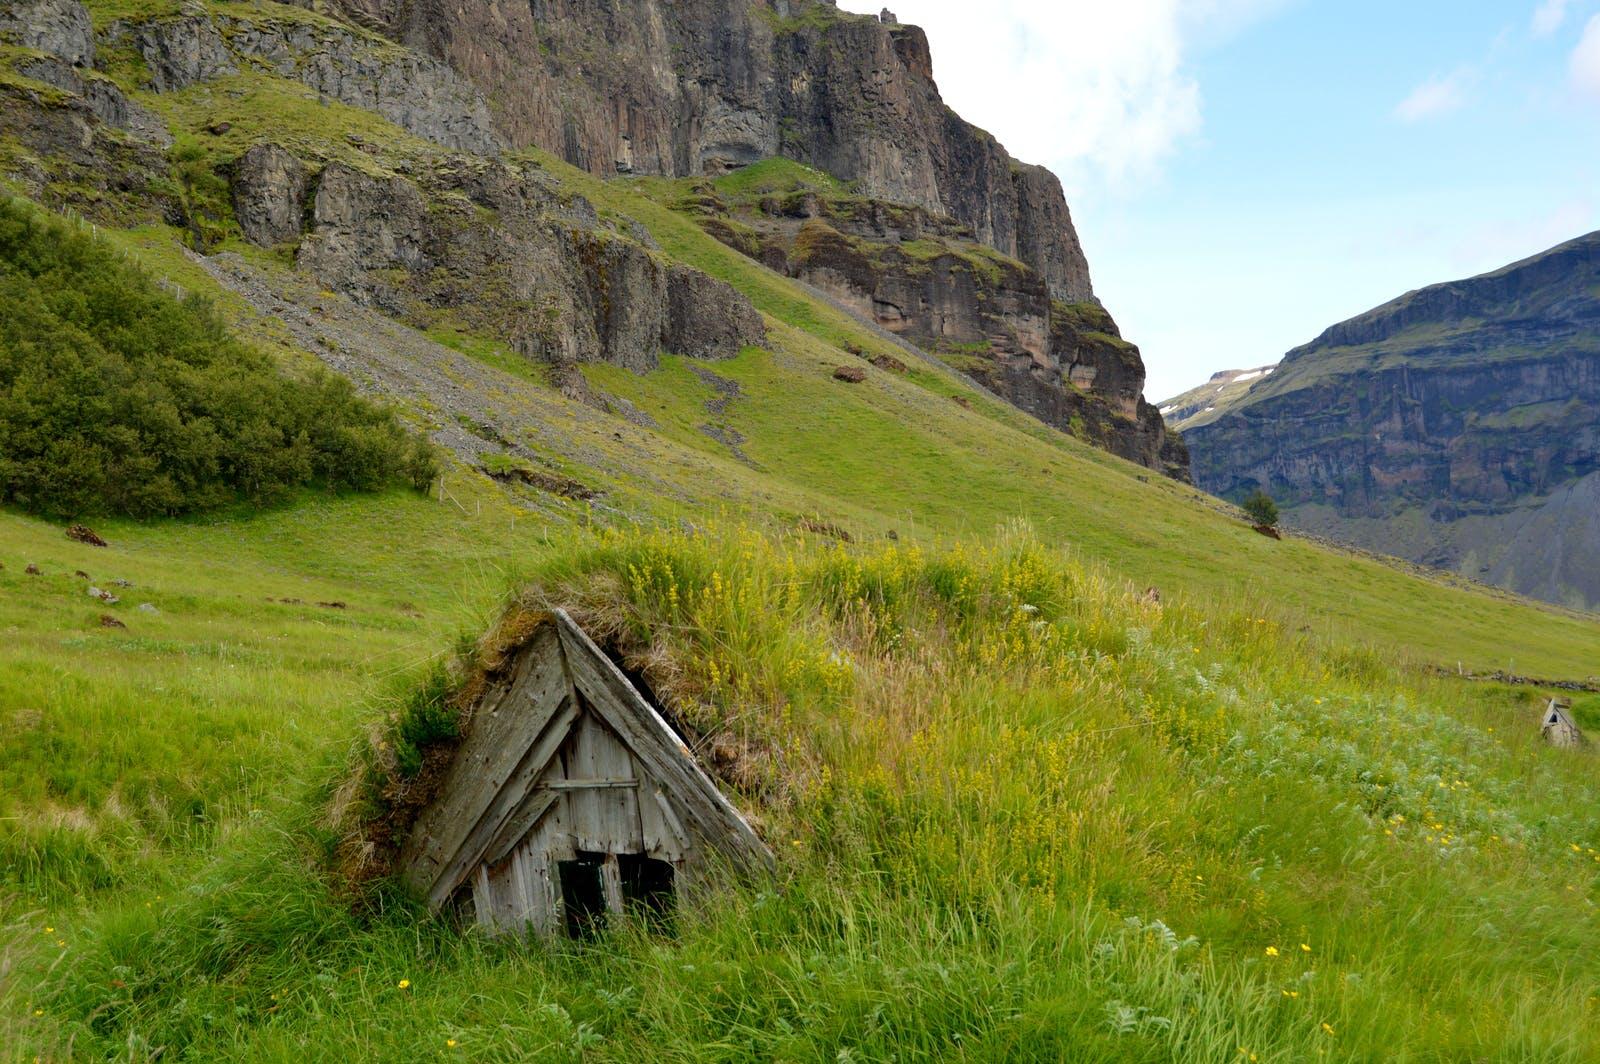 Núpsstaður Turf Church and Mt. Lómagnúpur in South-Iceland - the smallest Turf Church in Iceland